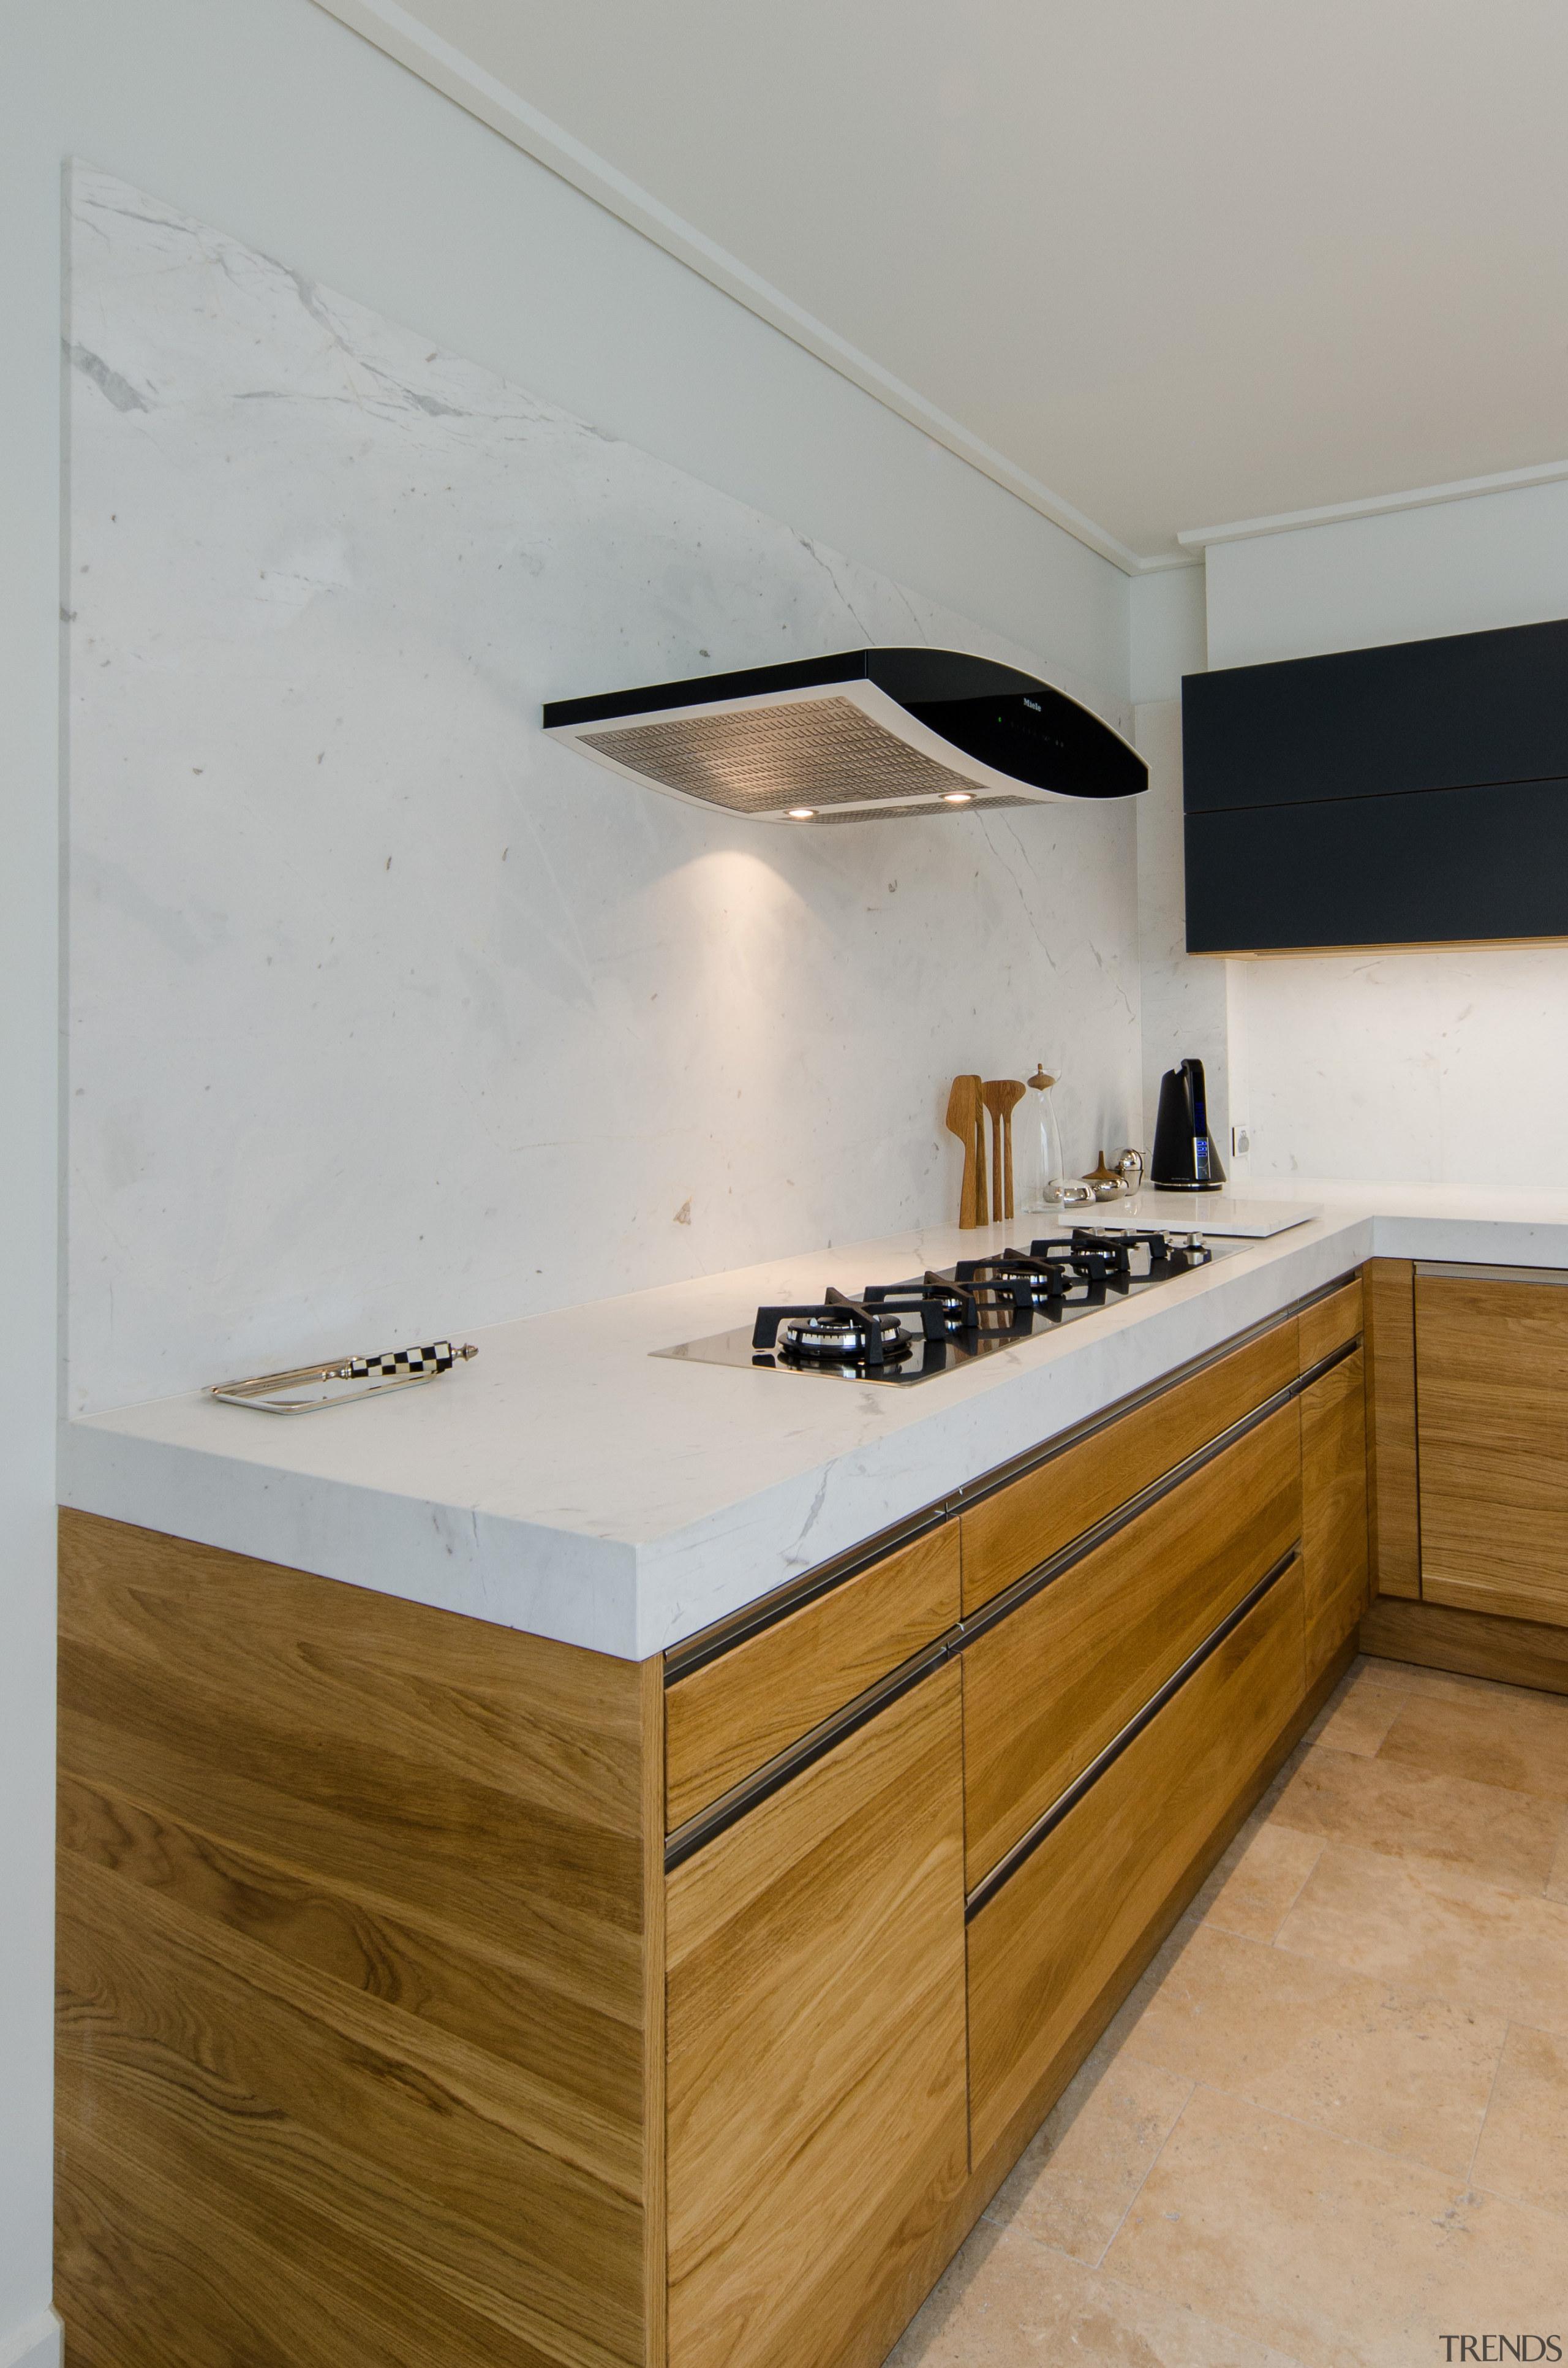 The Miele DA 7000 D Aura Island Rangehood cabinetry, countertop, cuisine classique, floor, interior design, kitchen, plywood, product design, room, sink, tap, wood, gray, brown